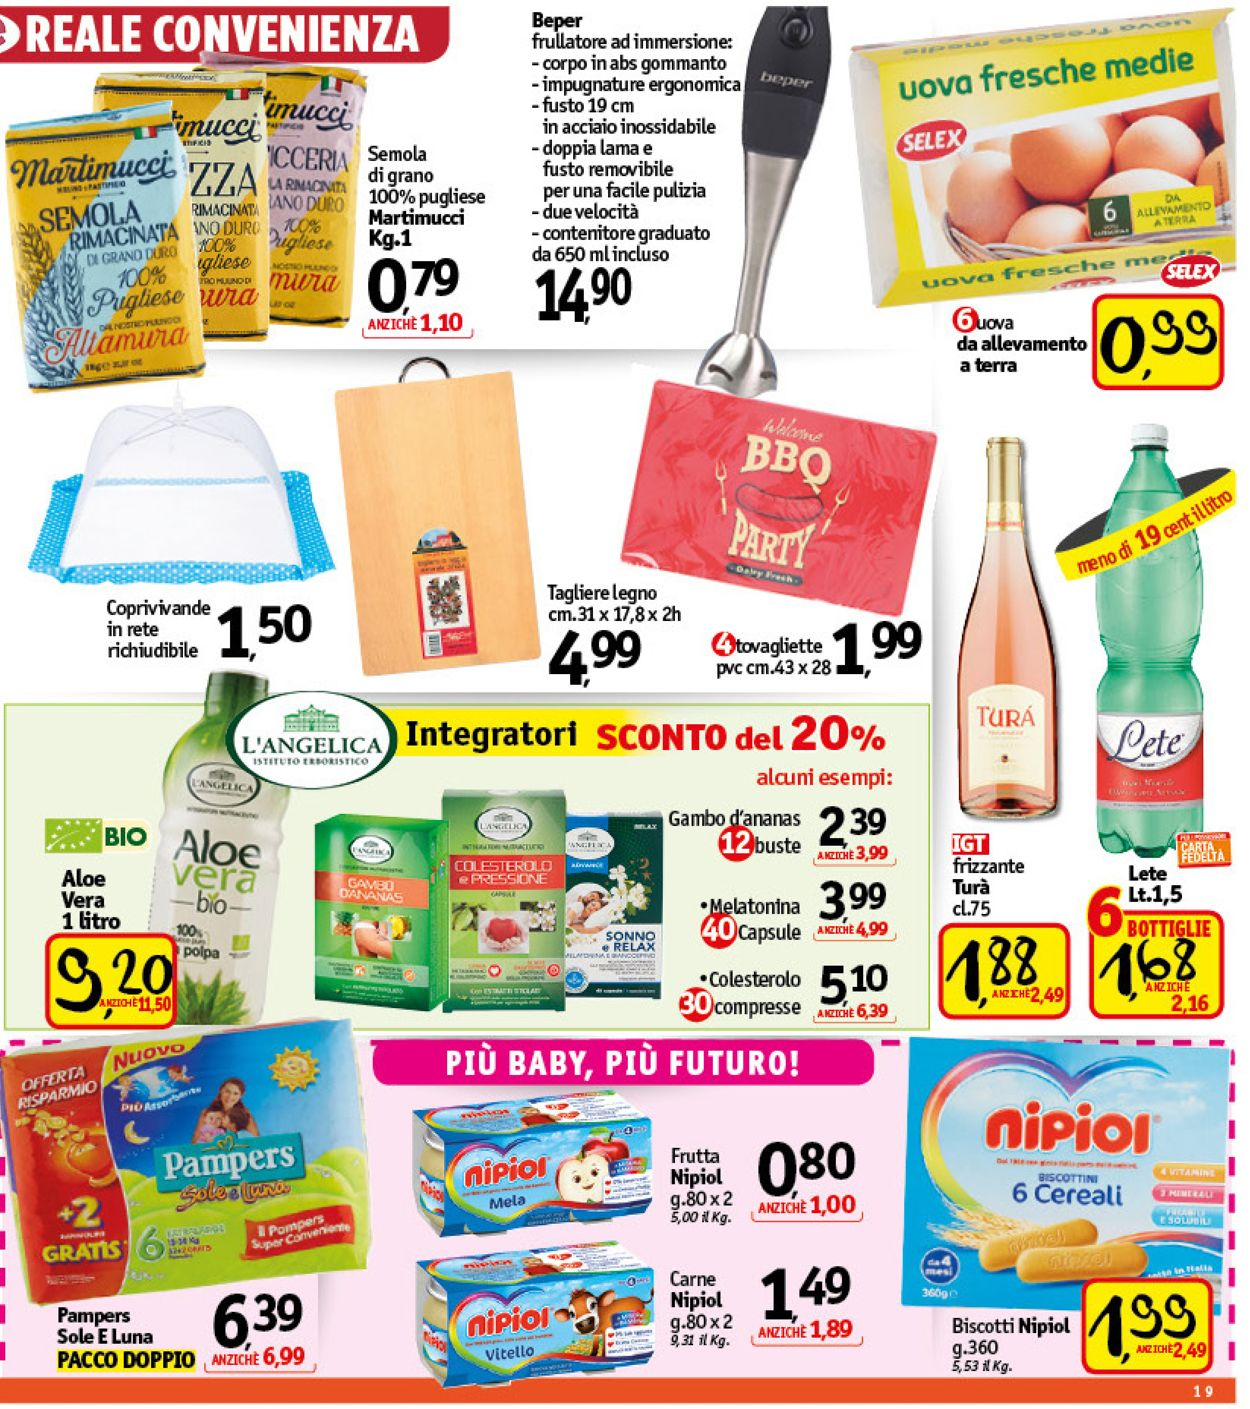 Volantino Famila - Offerte 17/06-26/06/2021 (Pagina 19)